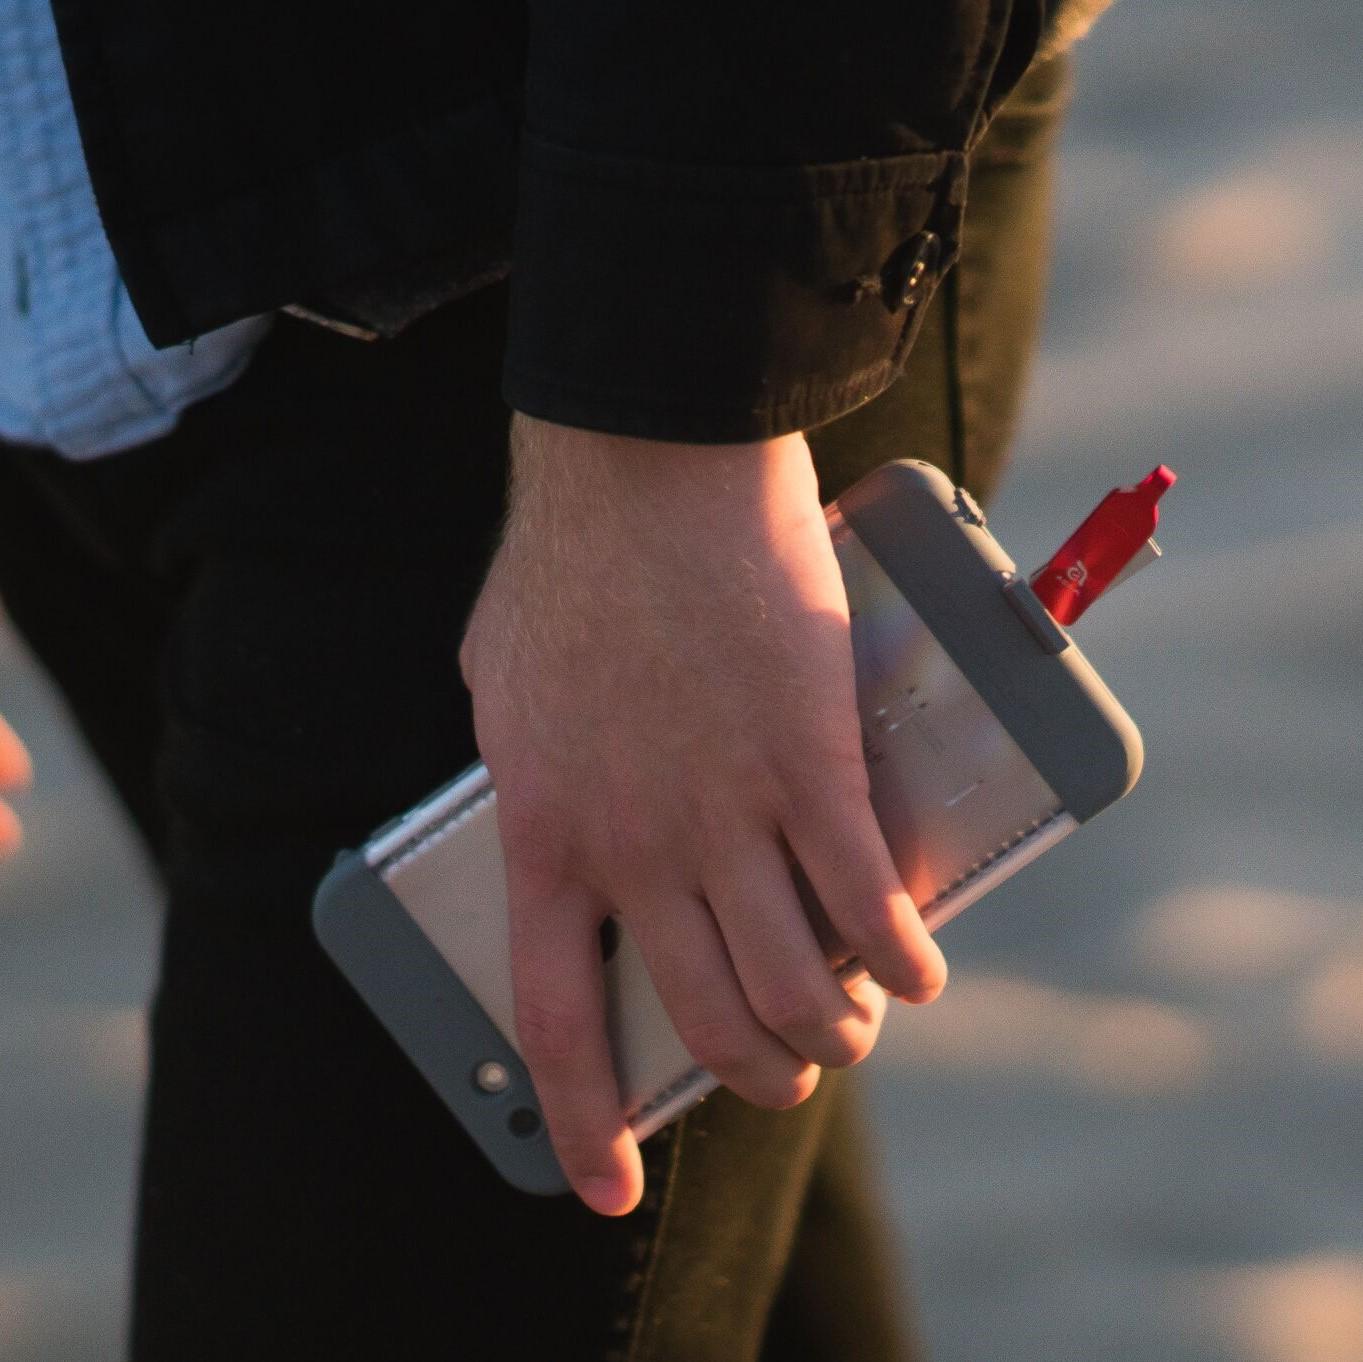 Adam Elements Iklips Duo Flash Disk S Lightningem A Usb31 64gb Element Drive 64 Gb Grey Ruka Drc Telefon V Mohutnm Obalu Se Zapojenm